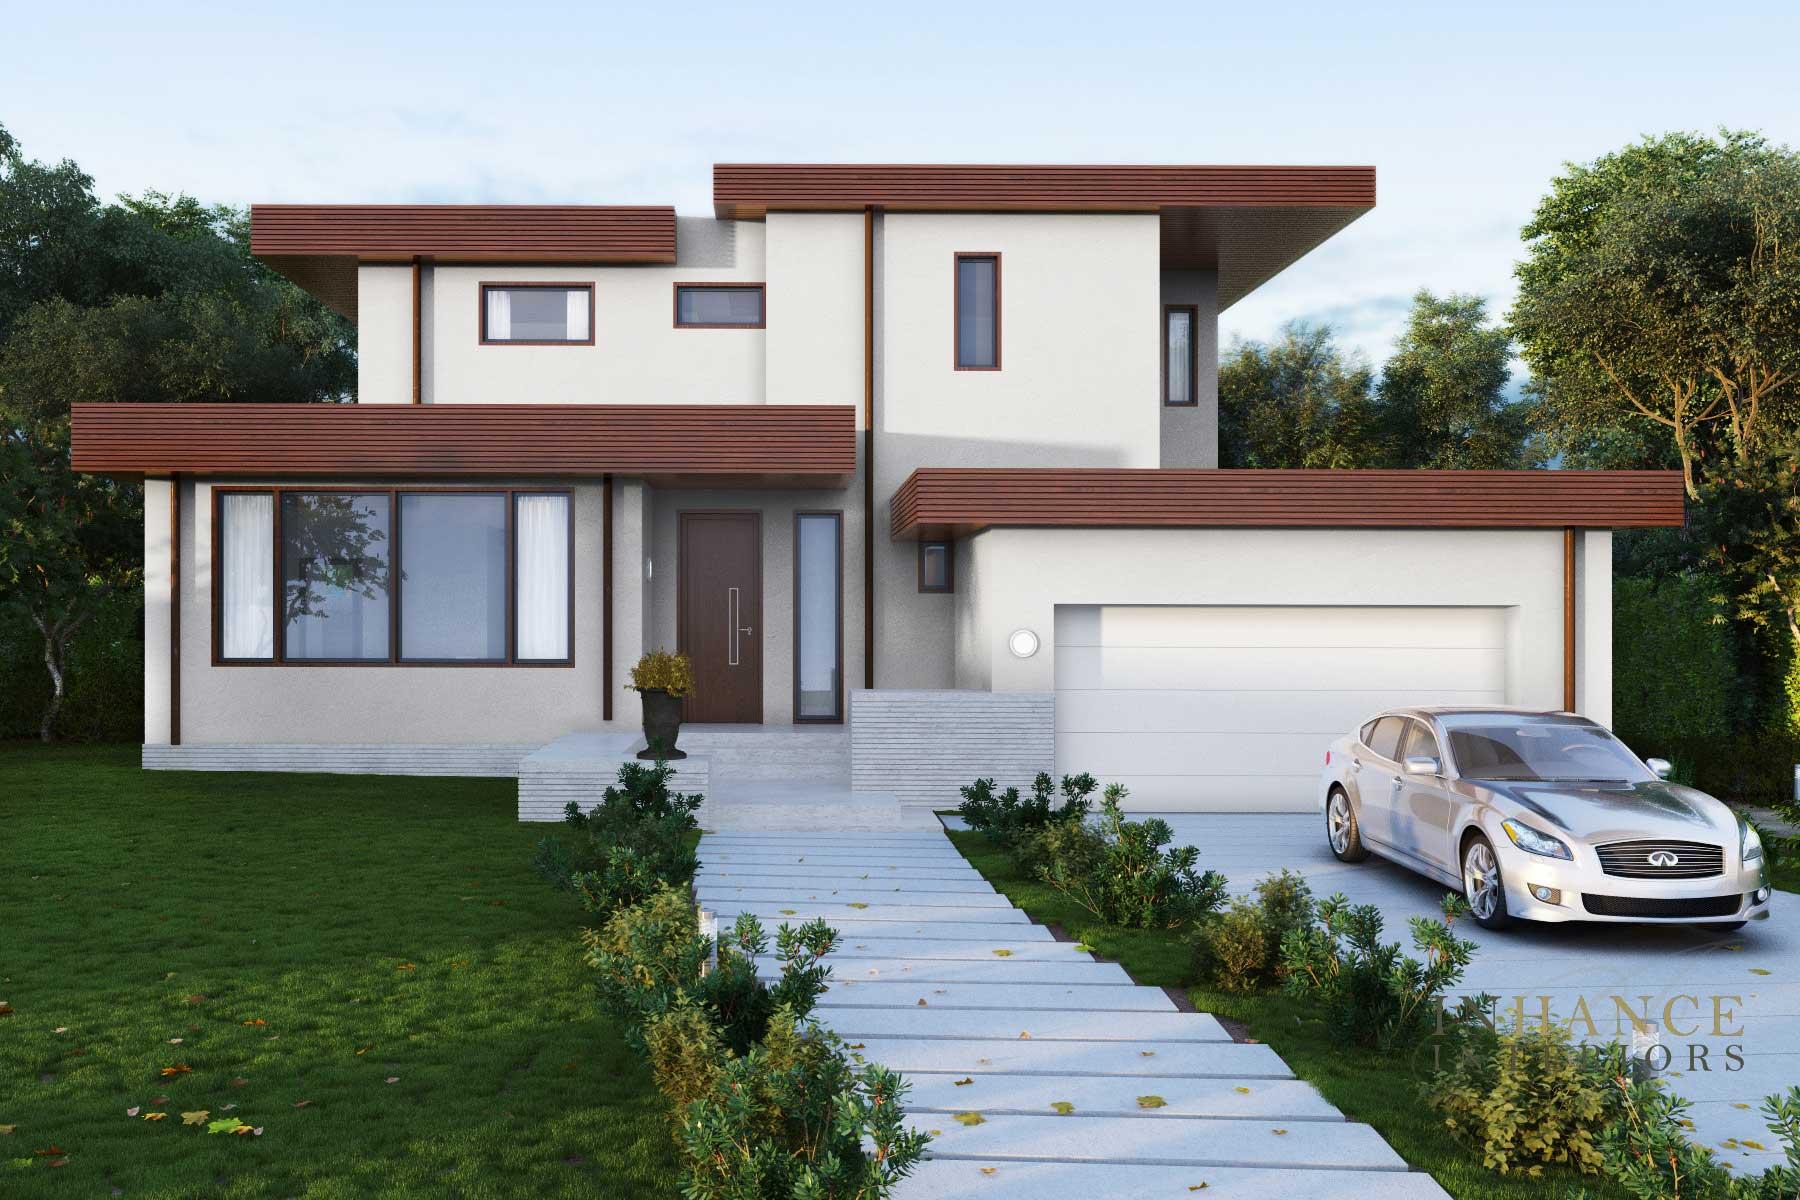 Loralyn: Modern New Construction